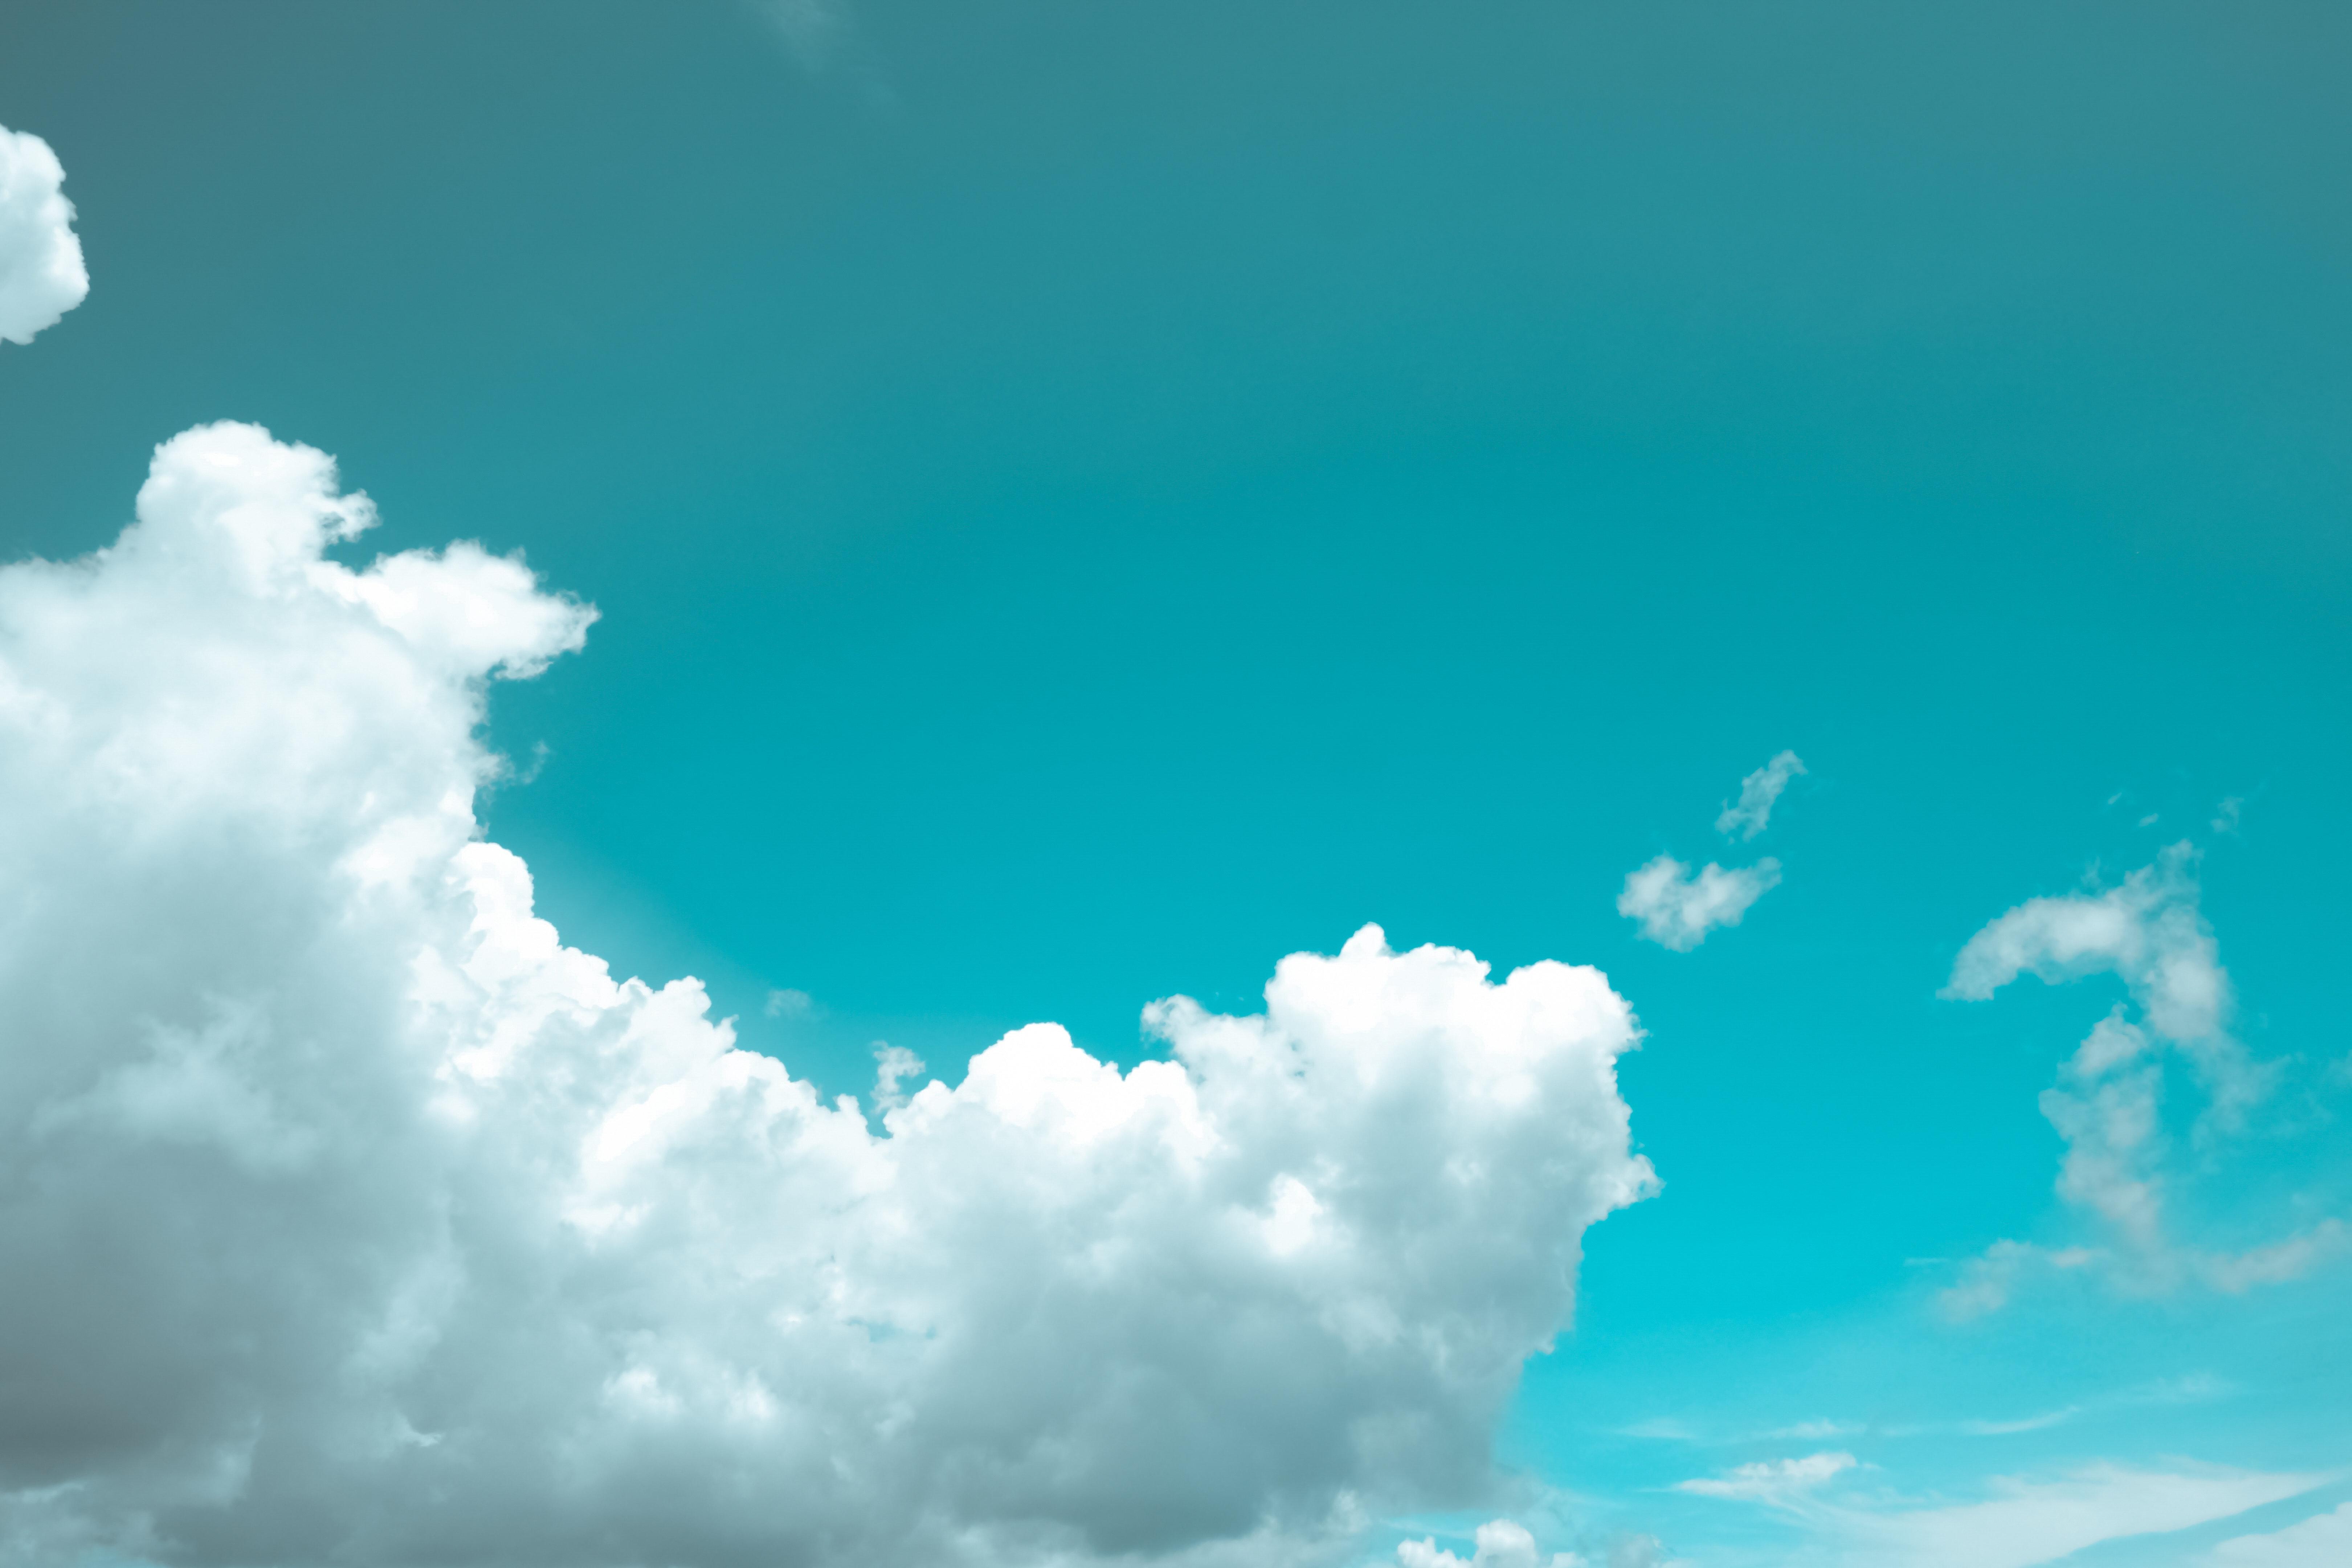 Foto De Stock Gratuita Sobre Cielo Fondo De Pantalla Hd Nubes